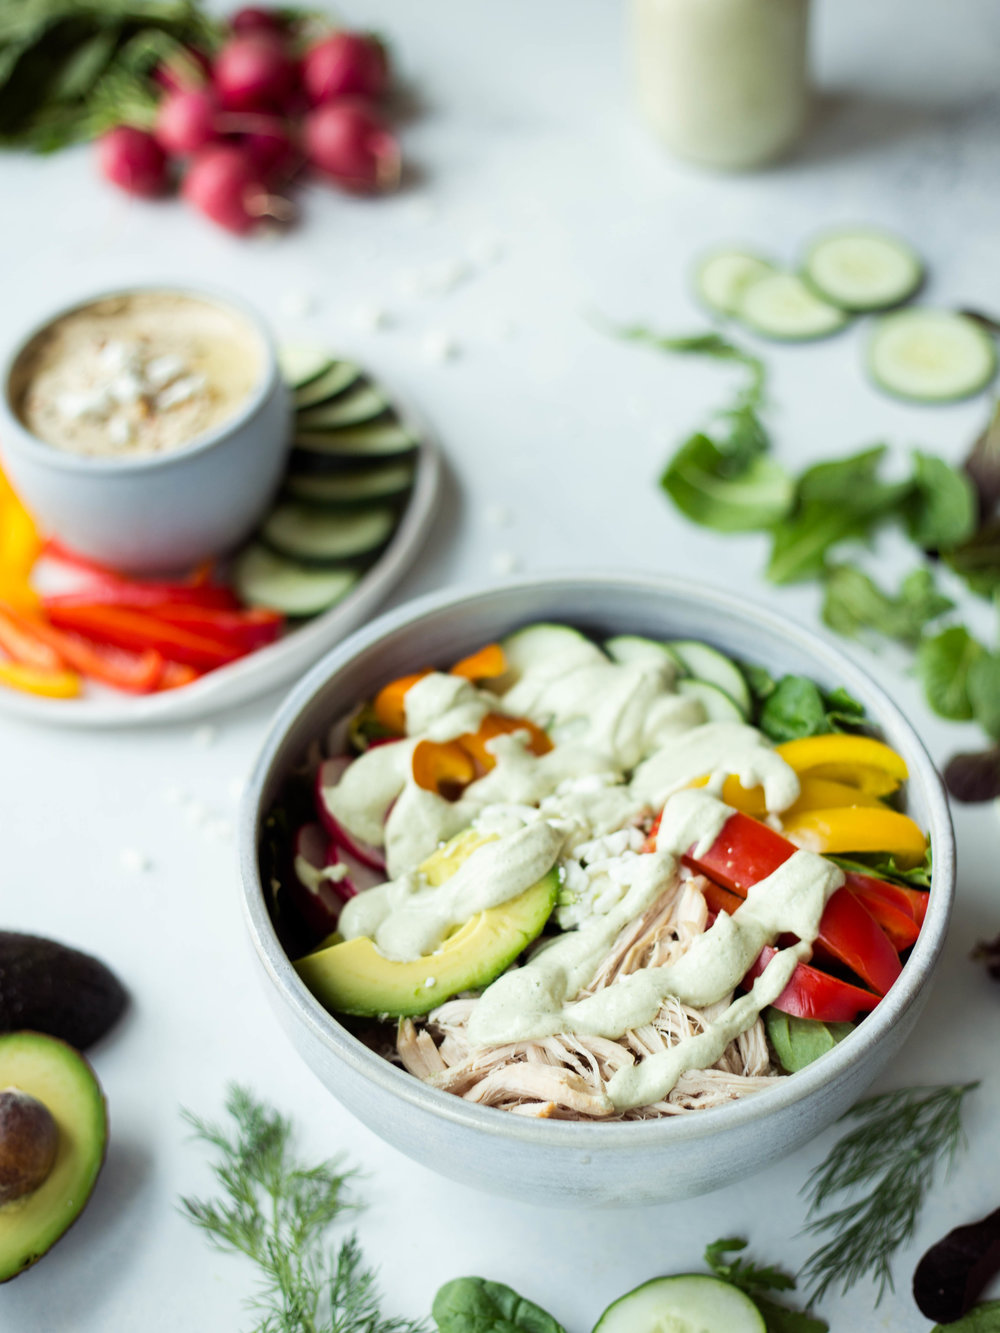 Greek Salad with Cashew Tzatziki Dressing | Jennifer Diaz | Vegan Tzatziki Dressing | Vegan Salad Dressing | Summer Salad Idea | Filling Well-balalned Meals